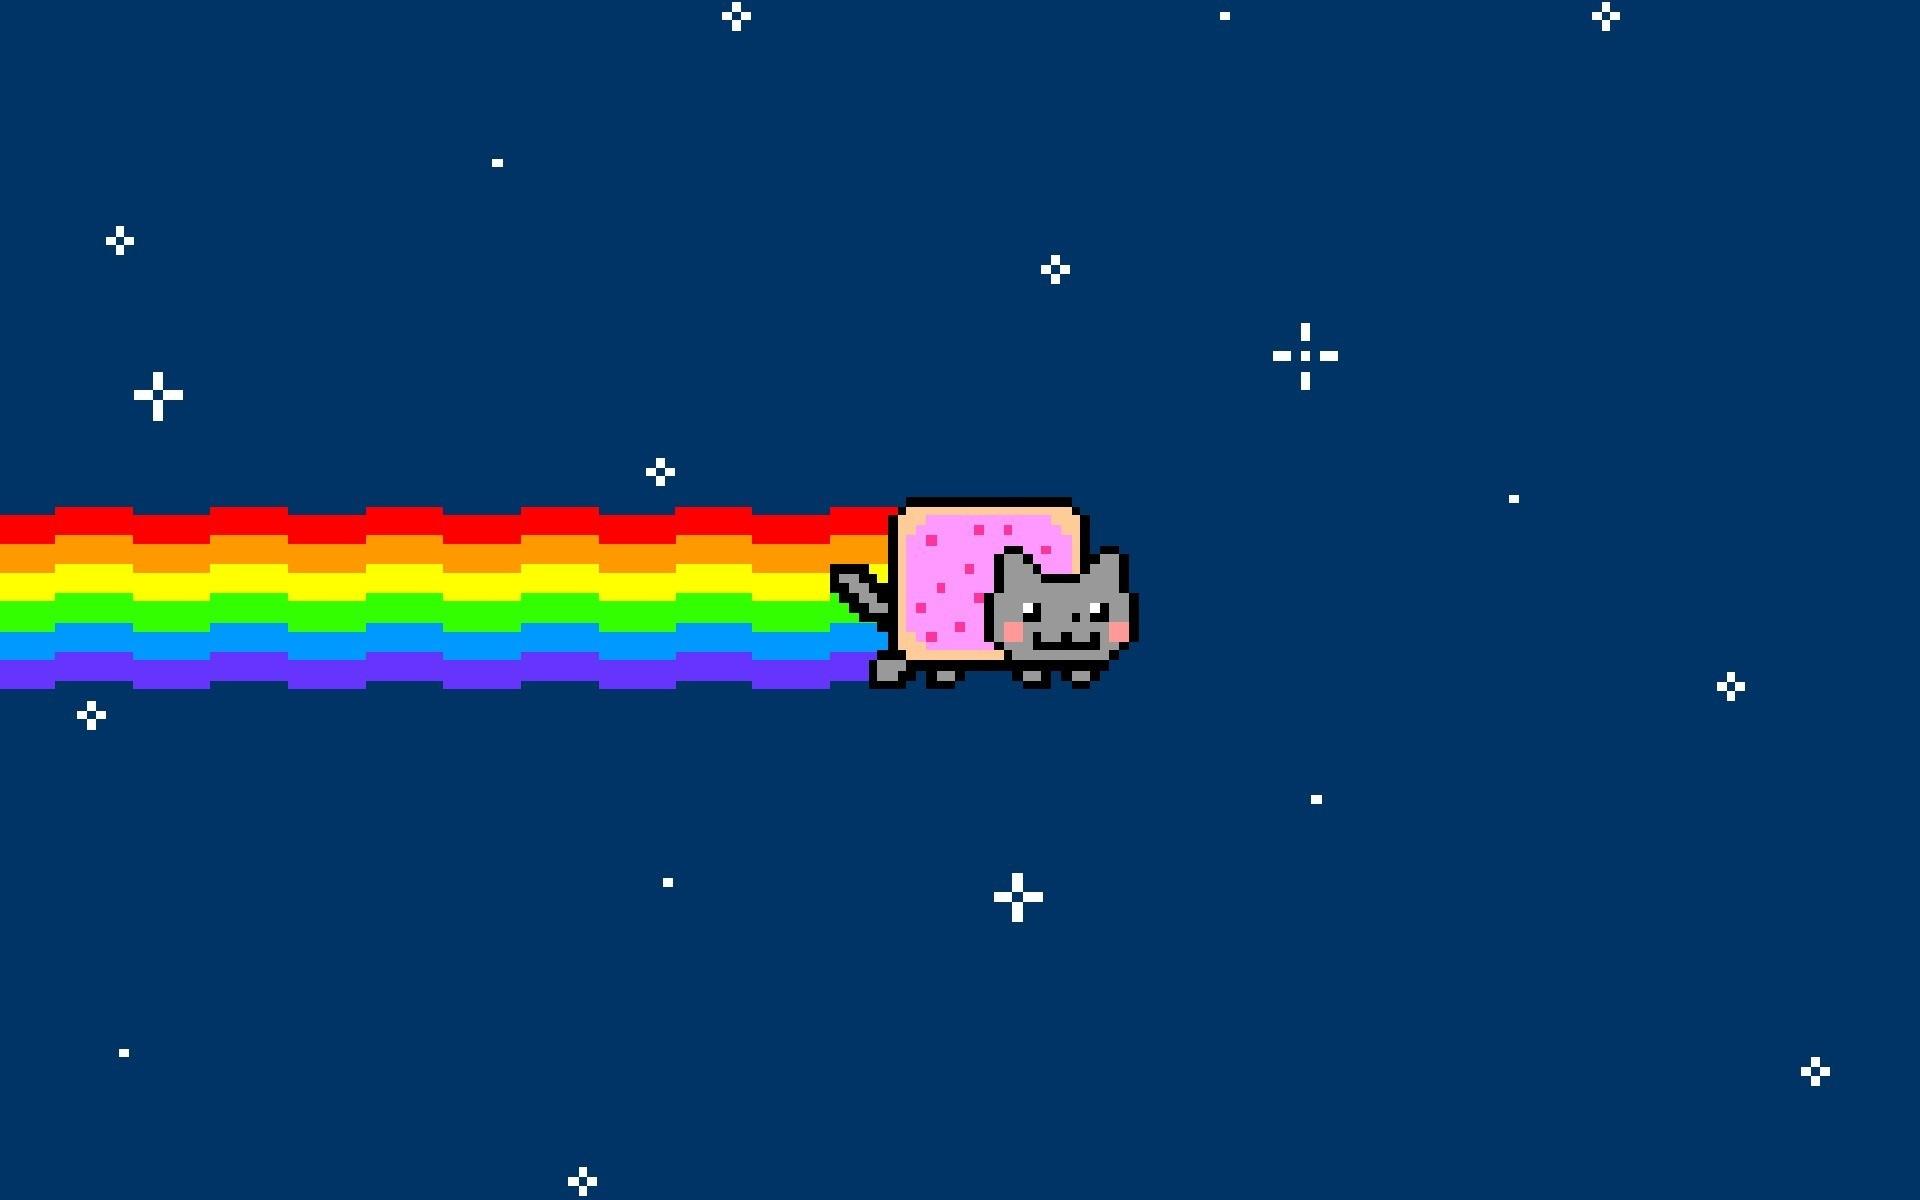 Nyan Cat Wallpaper